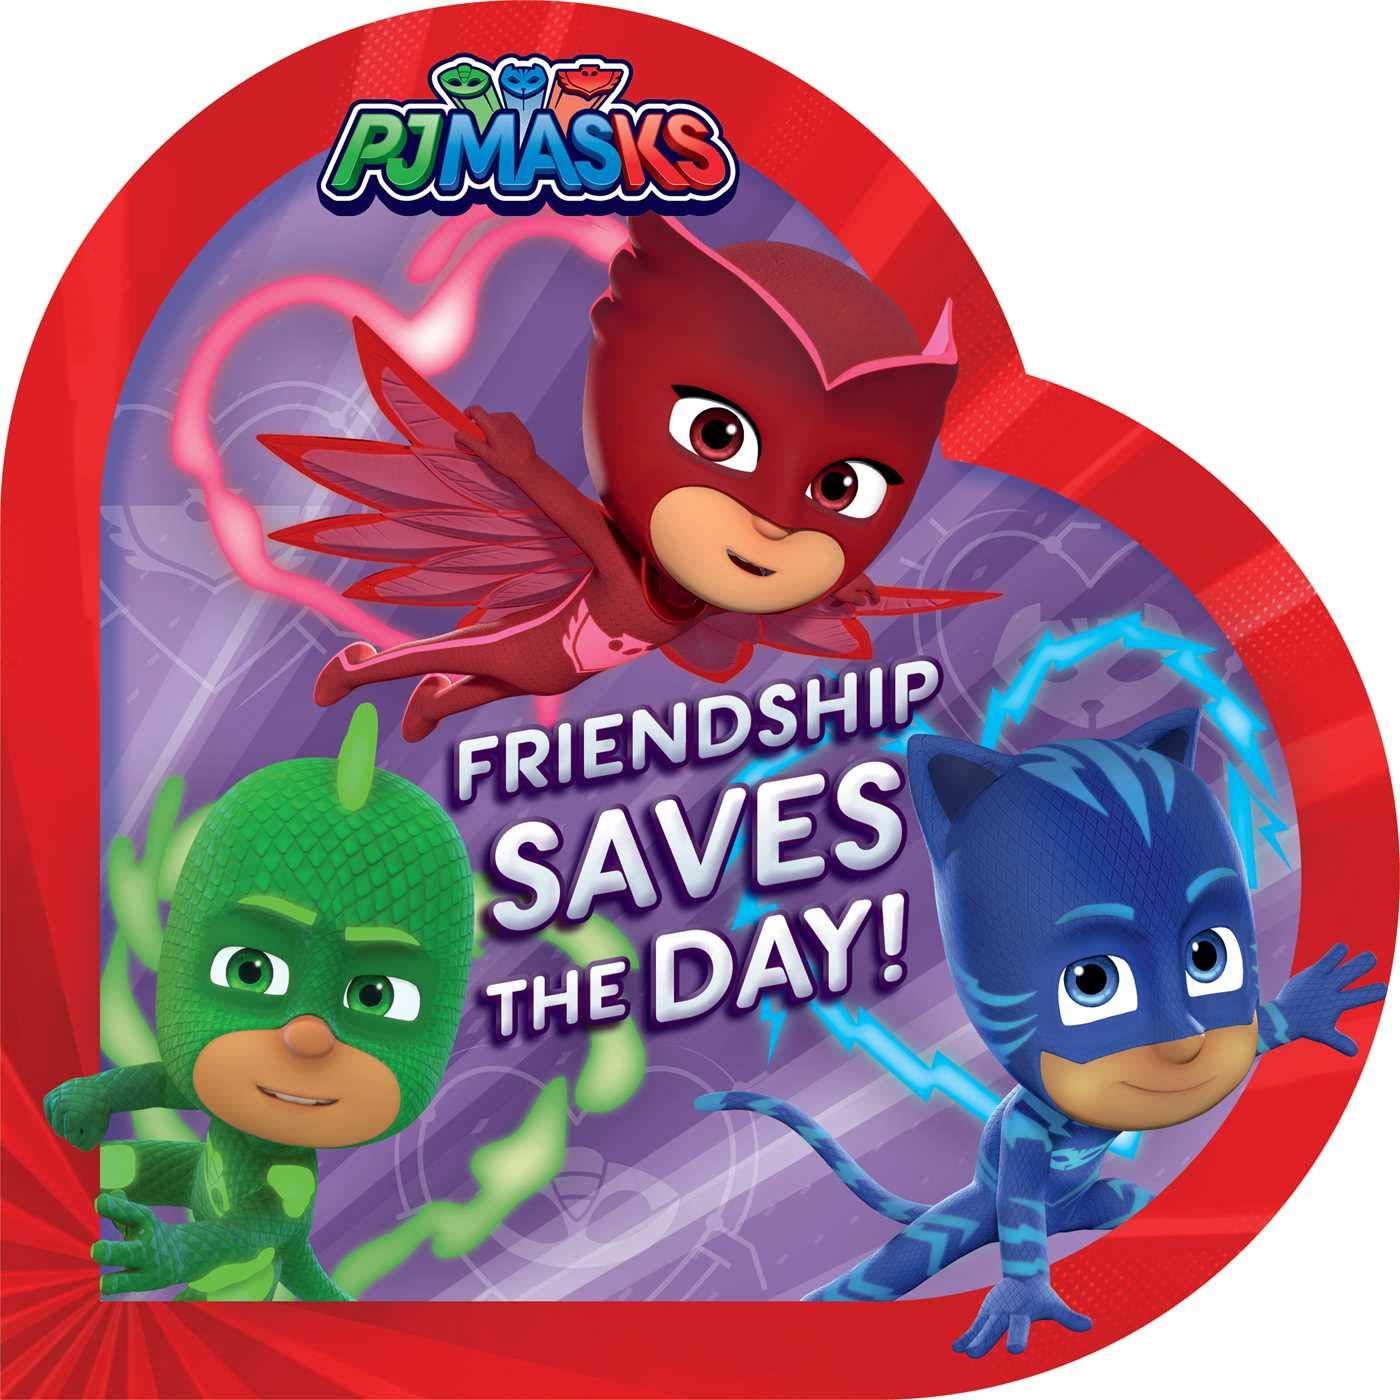 Friendship Saves the Day! (Pj Masks) : Hastings, Ximena ...